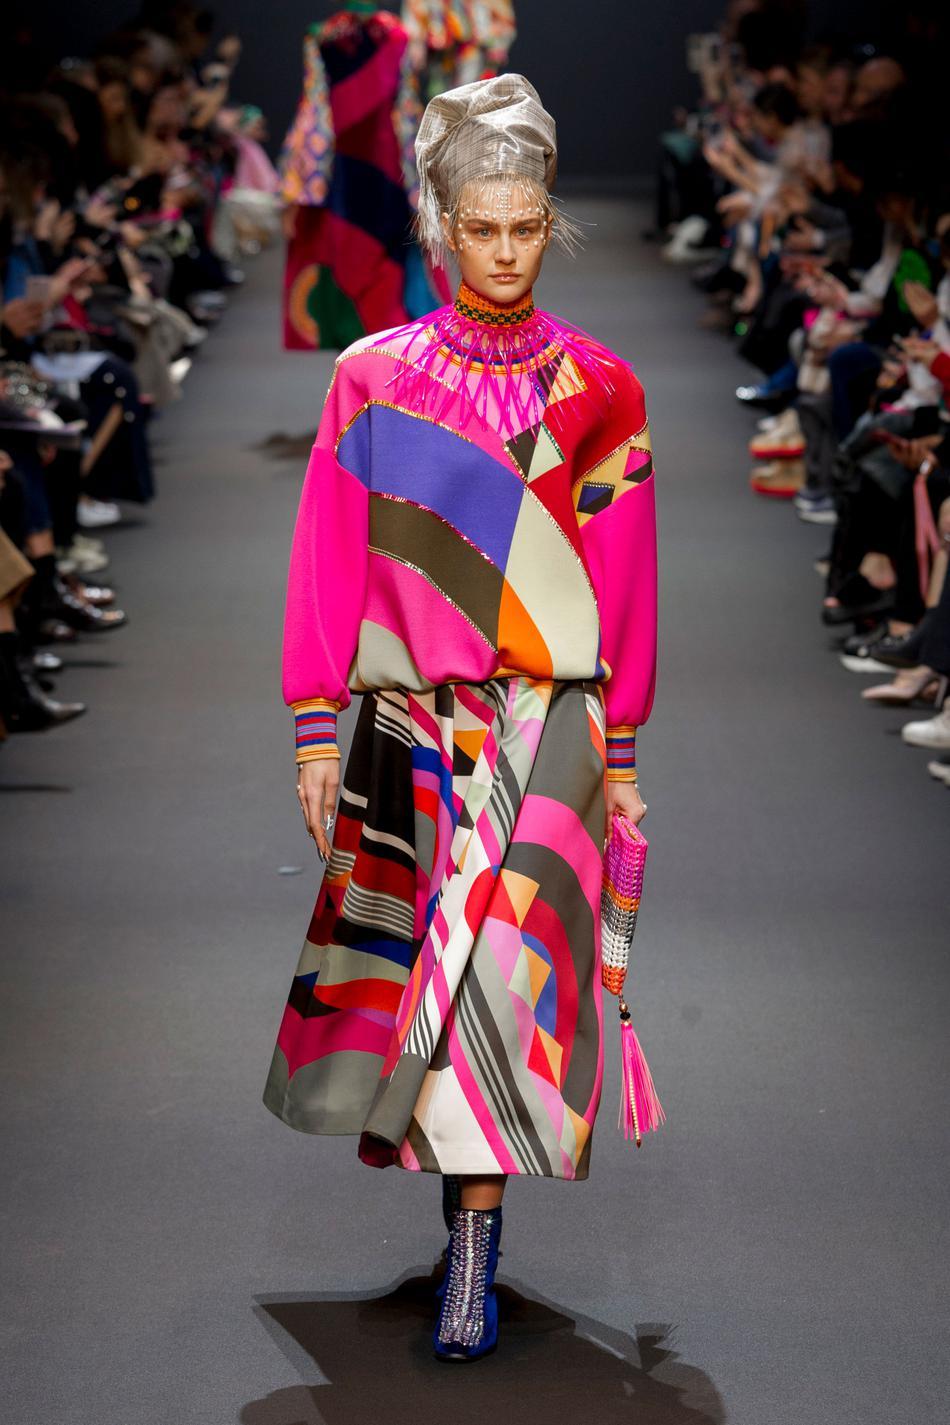 Défilé Manish Arora Fashion Week 2017 - Look 16